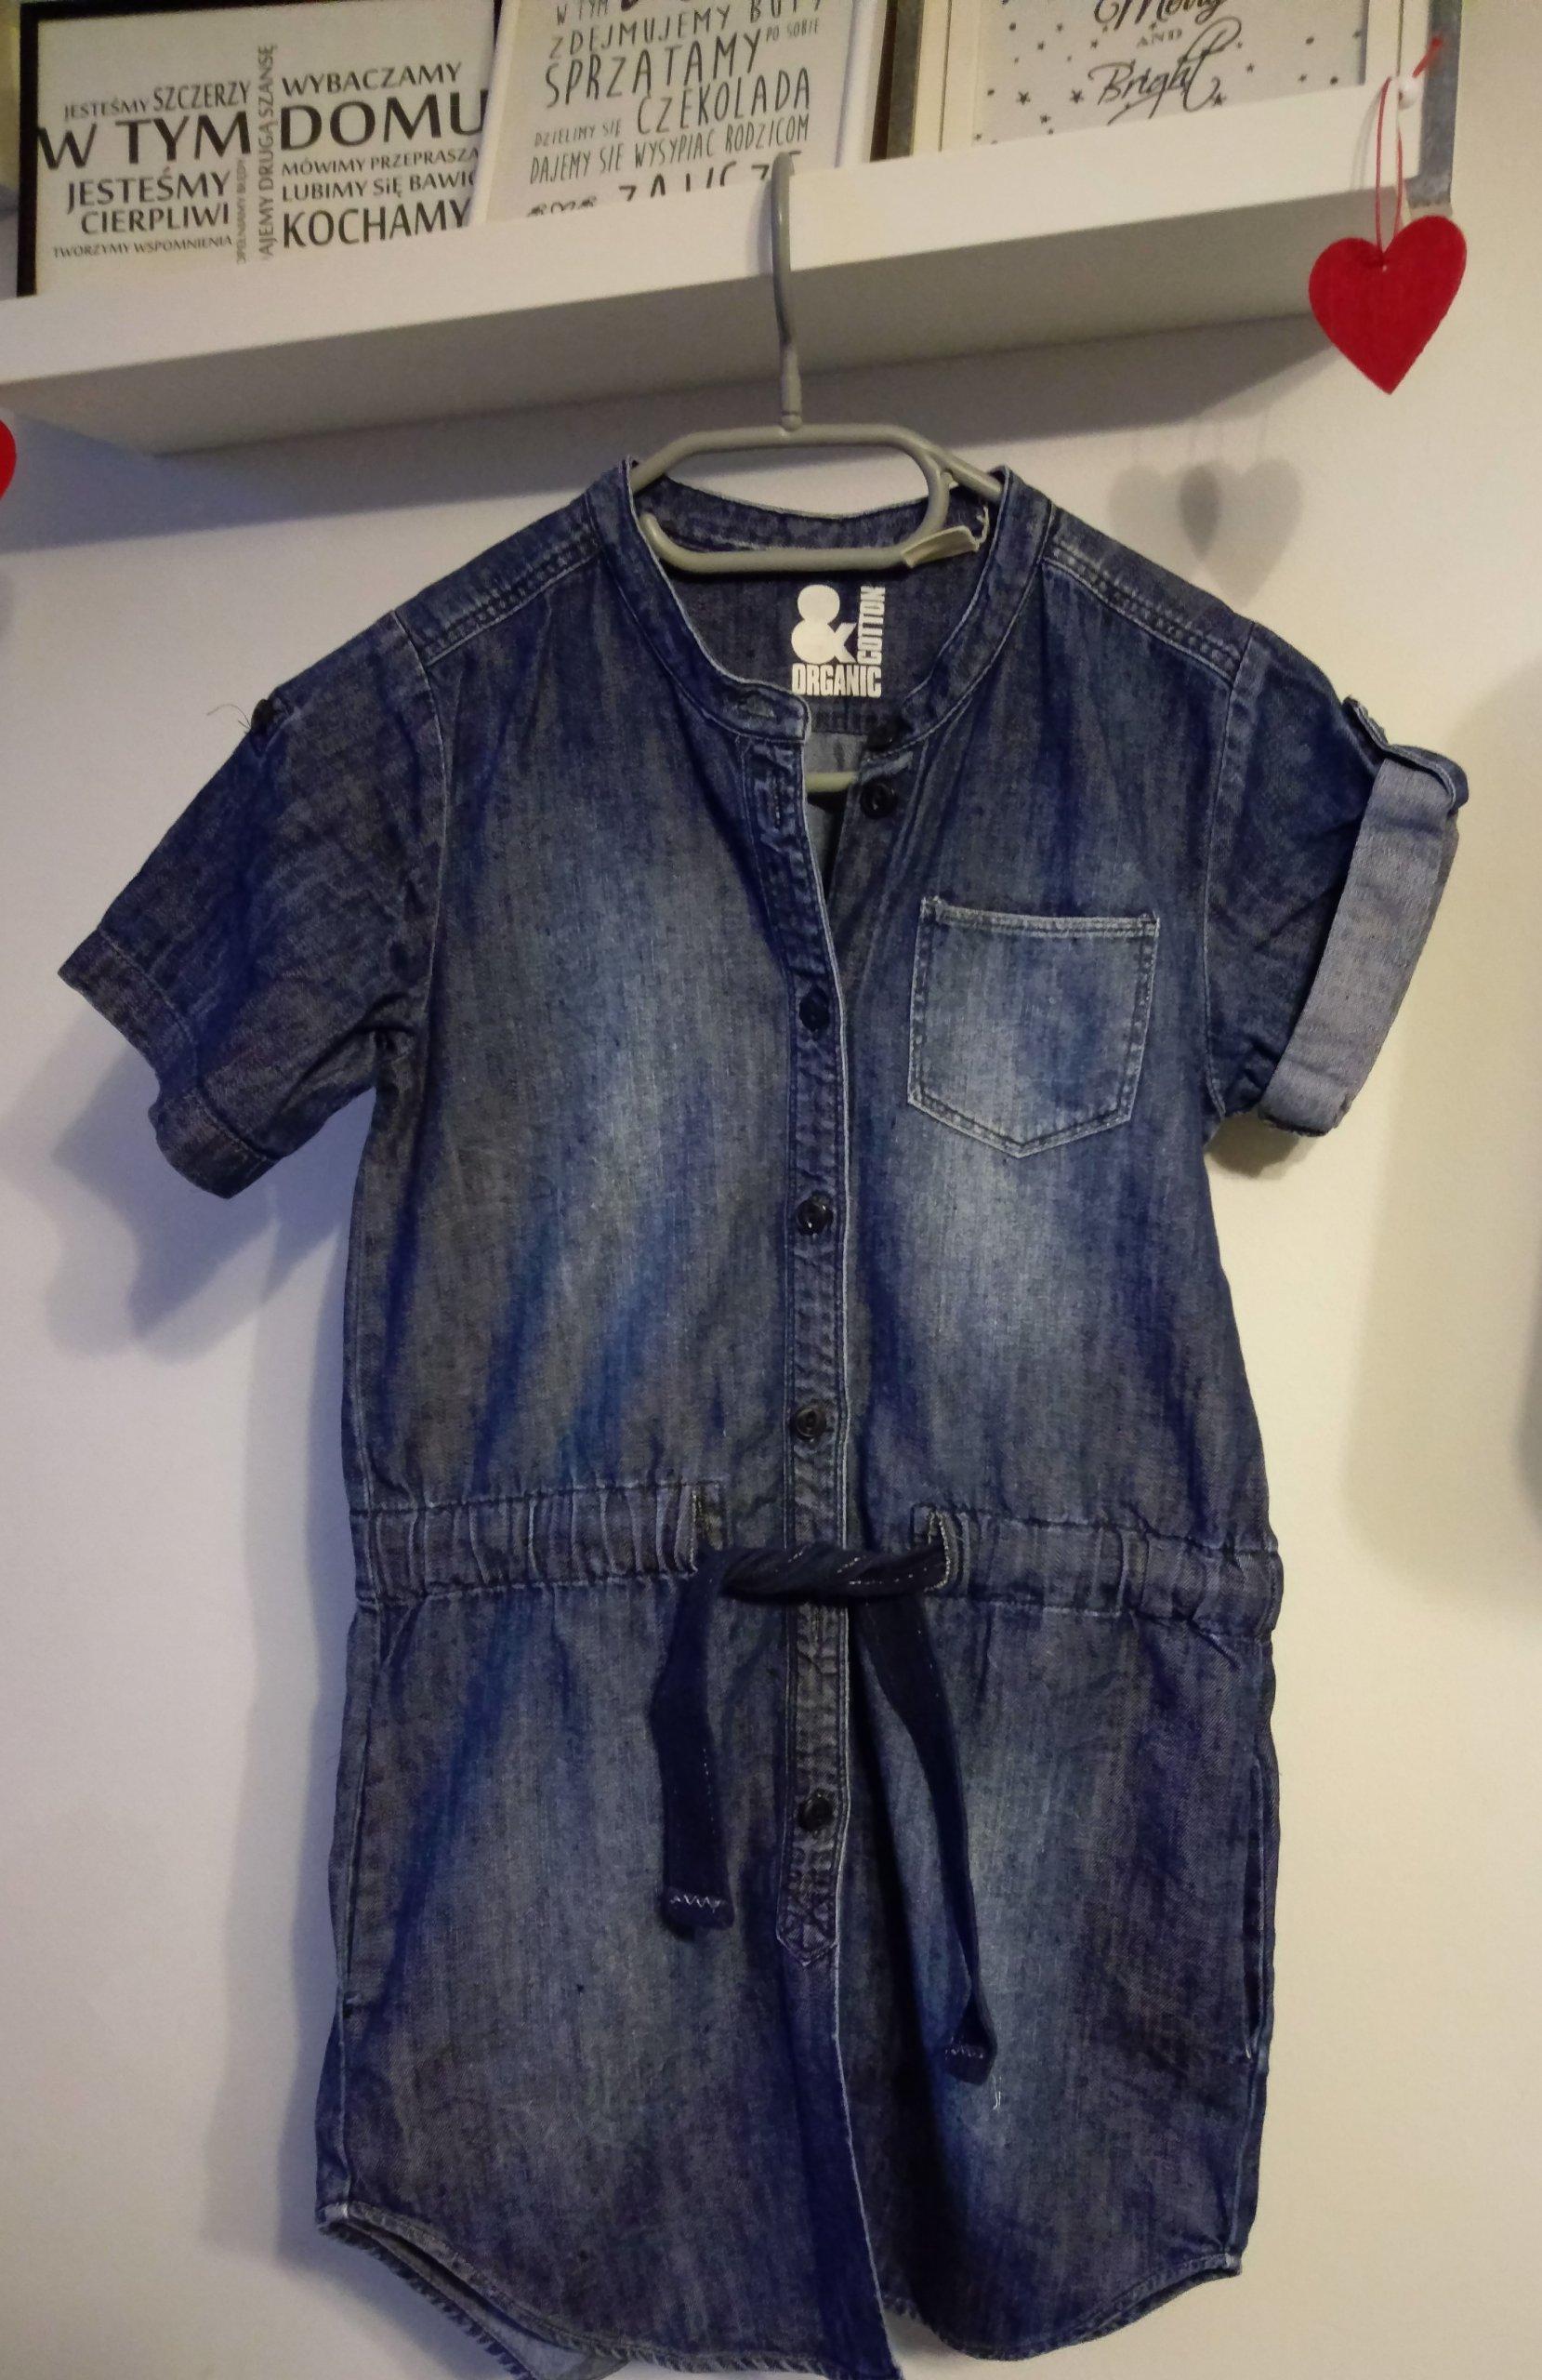 bd8b6914d1 H m sukienka jeansowa 134 - 7283985058 - oficjalne archiwum allegro